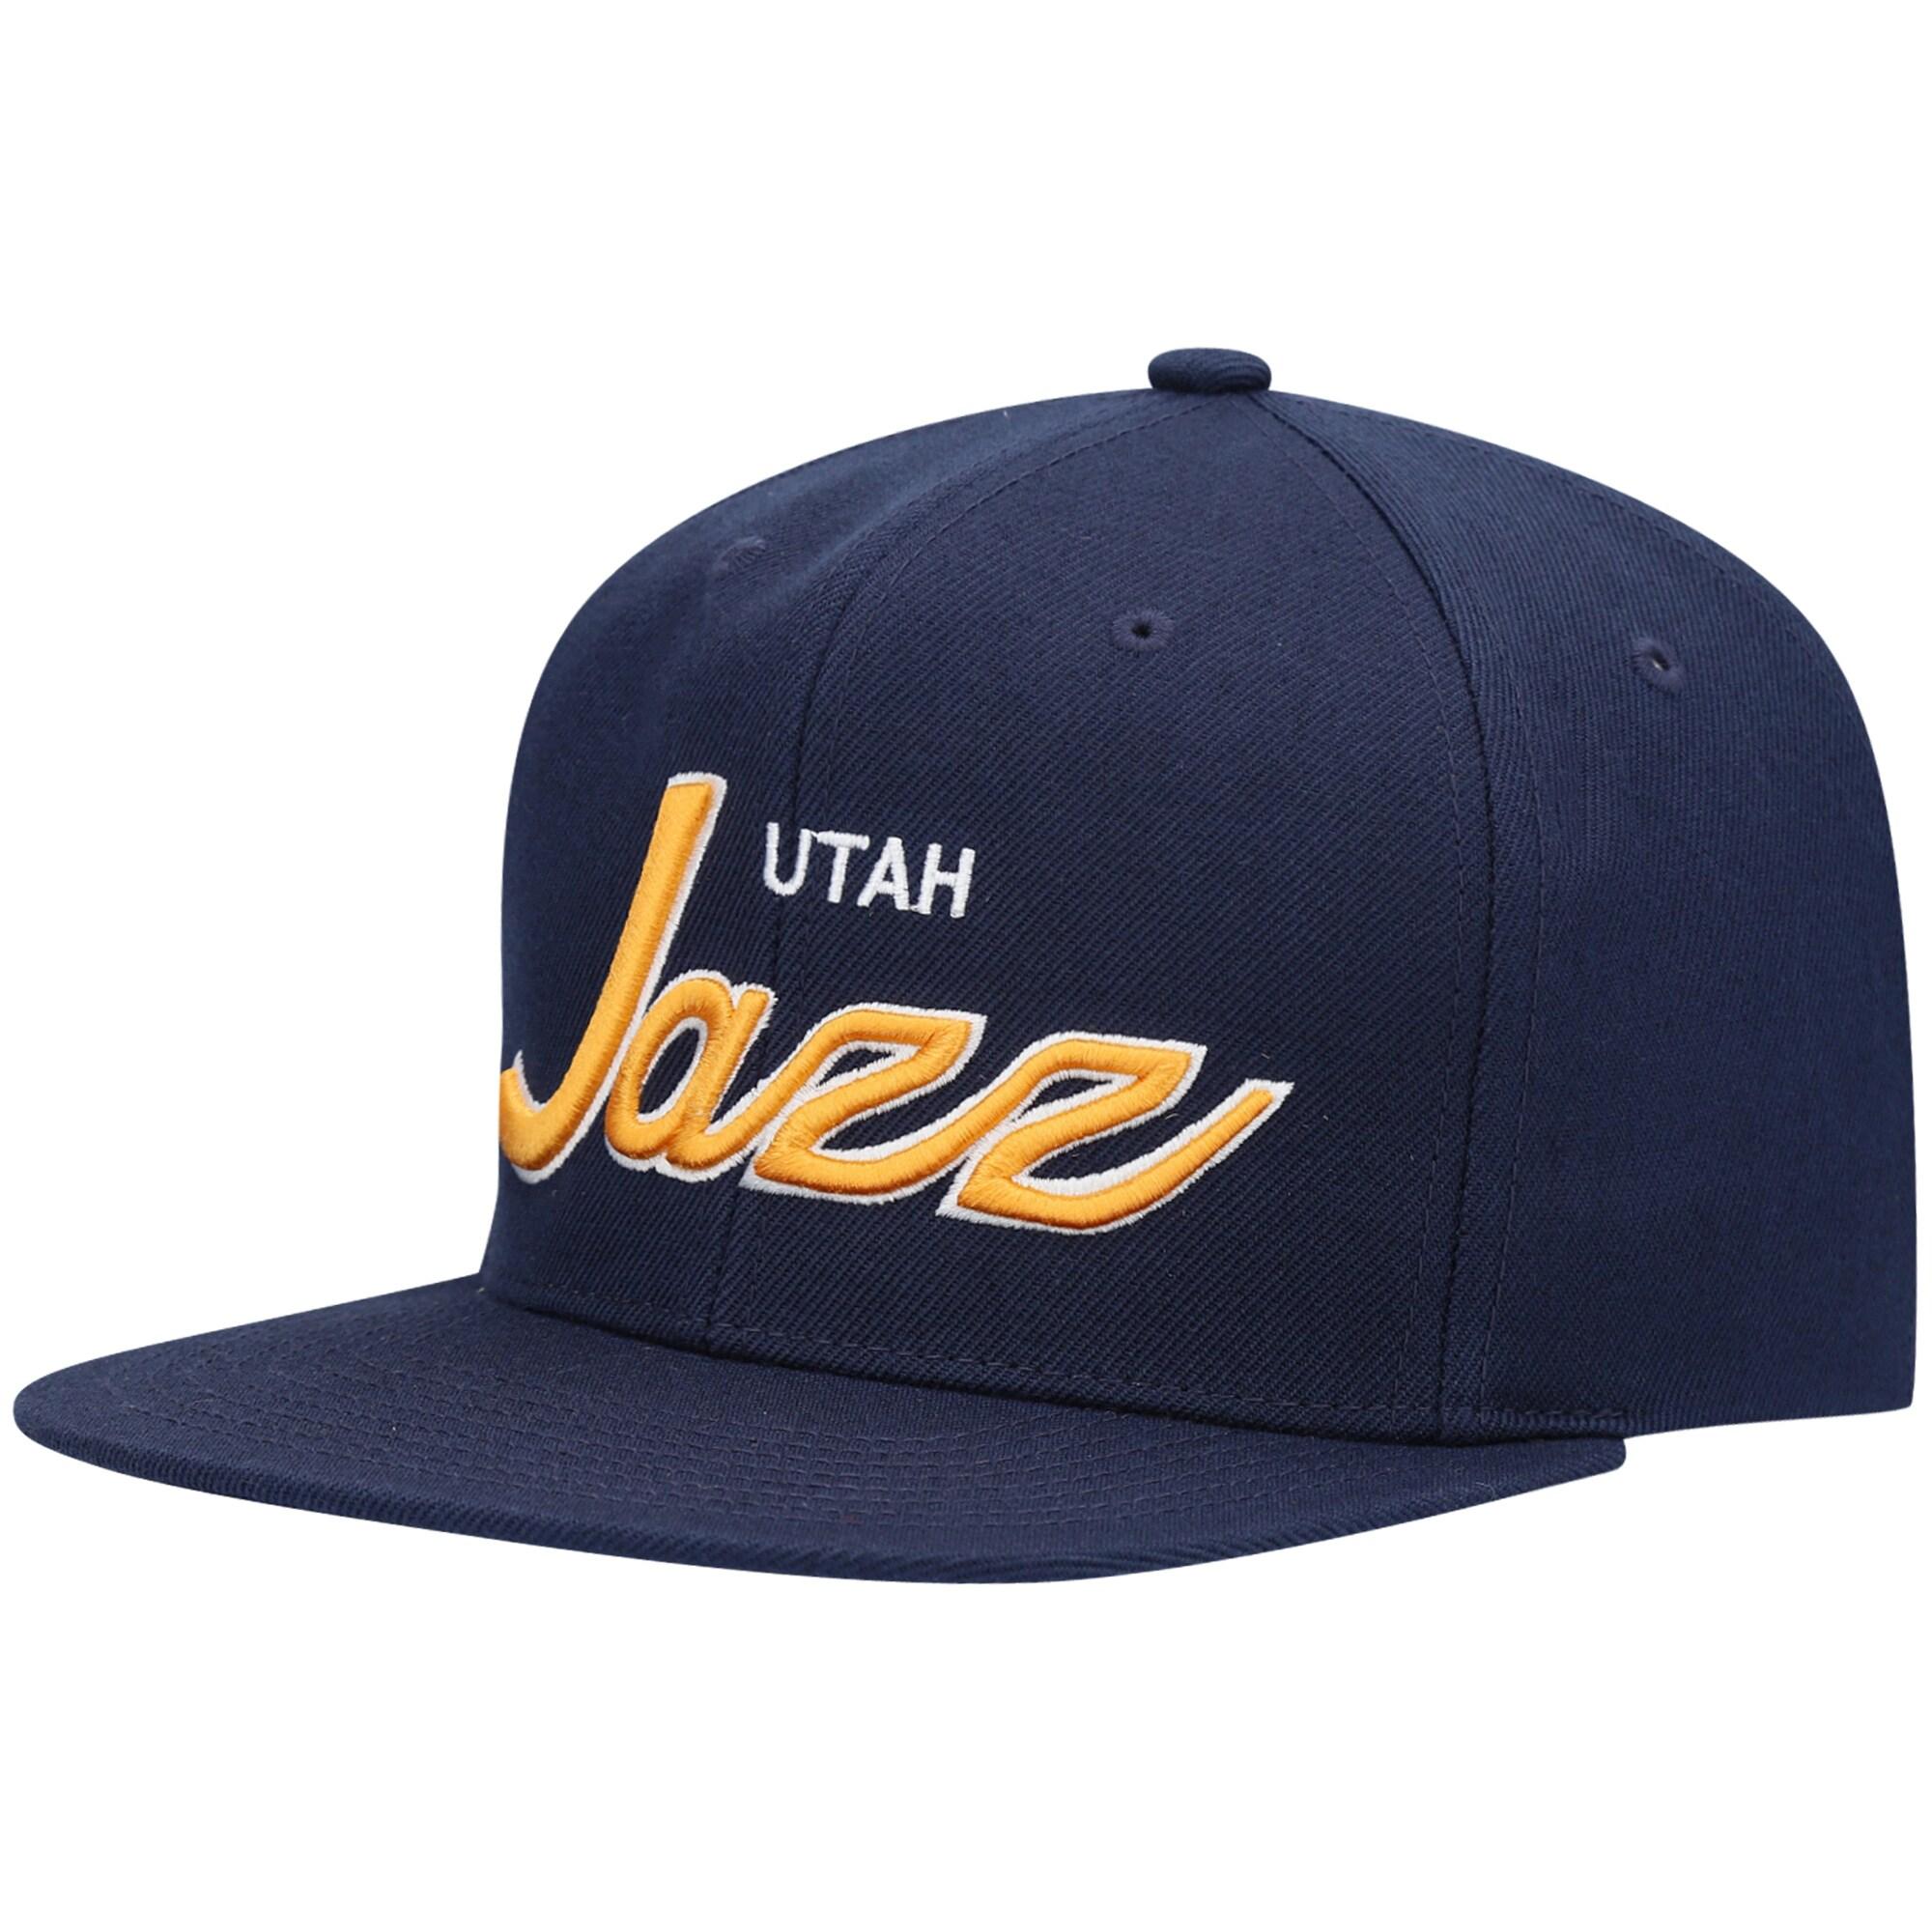 Utah Jazz Mitchell & Ness 2020 Playoffs Script Snapback Hat - Navy